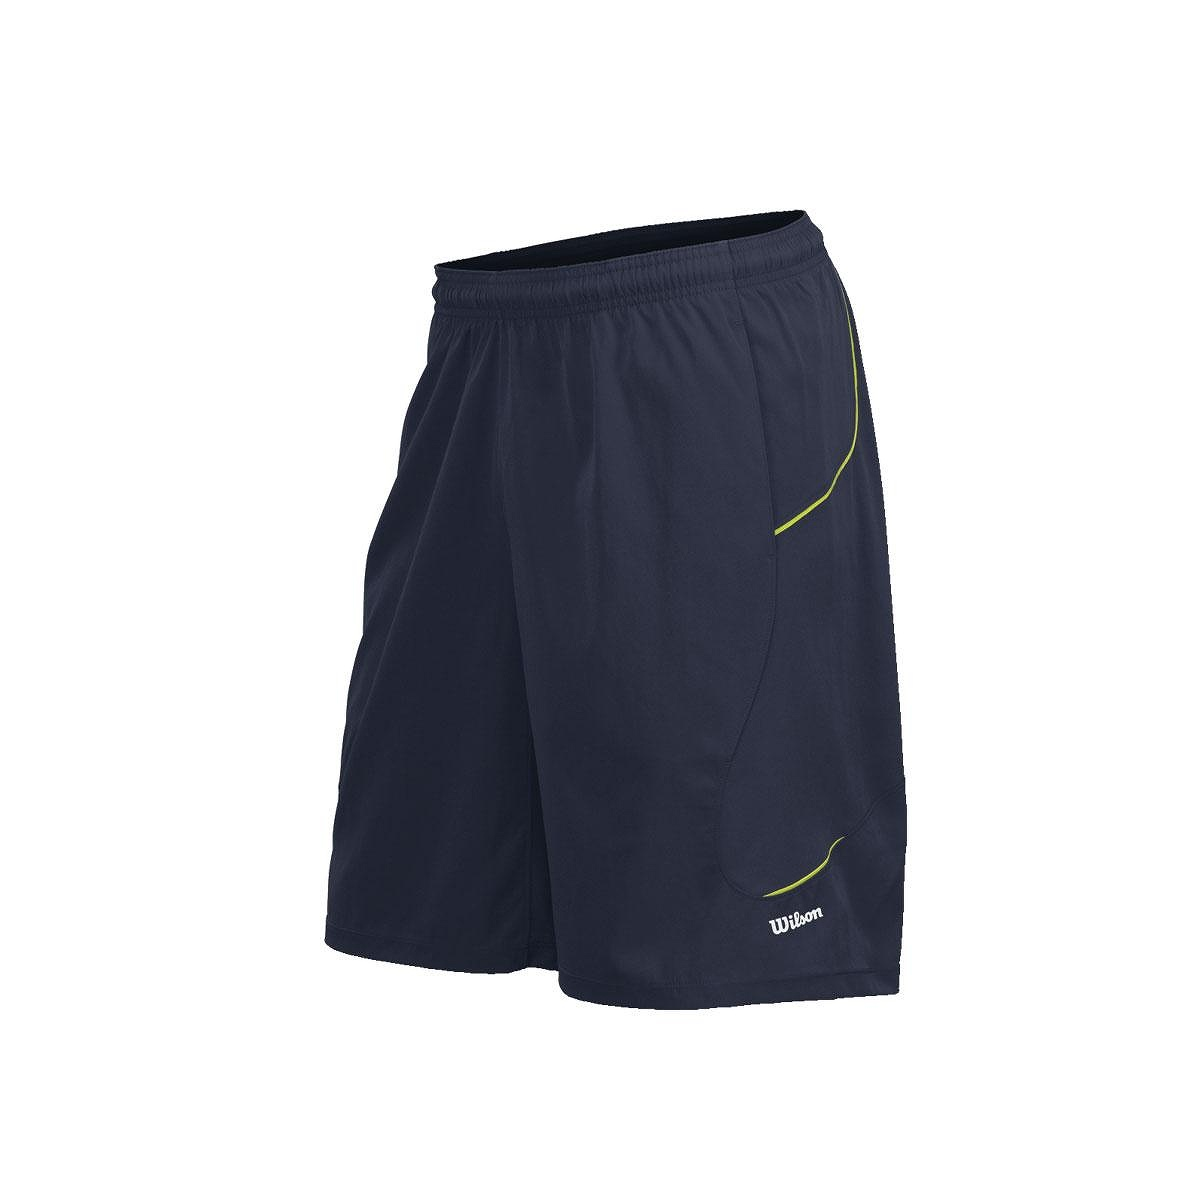 Quần Tennis Wilson MEN'S EXPLOSIVE SHORT - WRA 141504